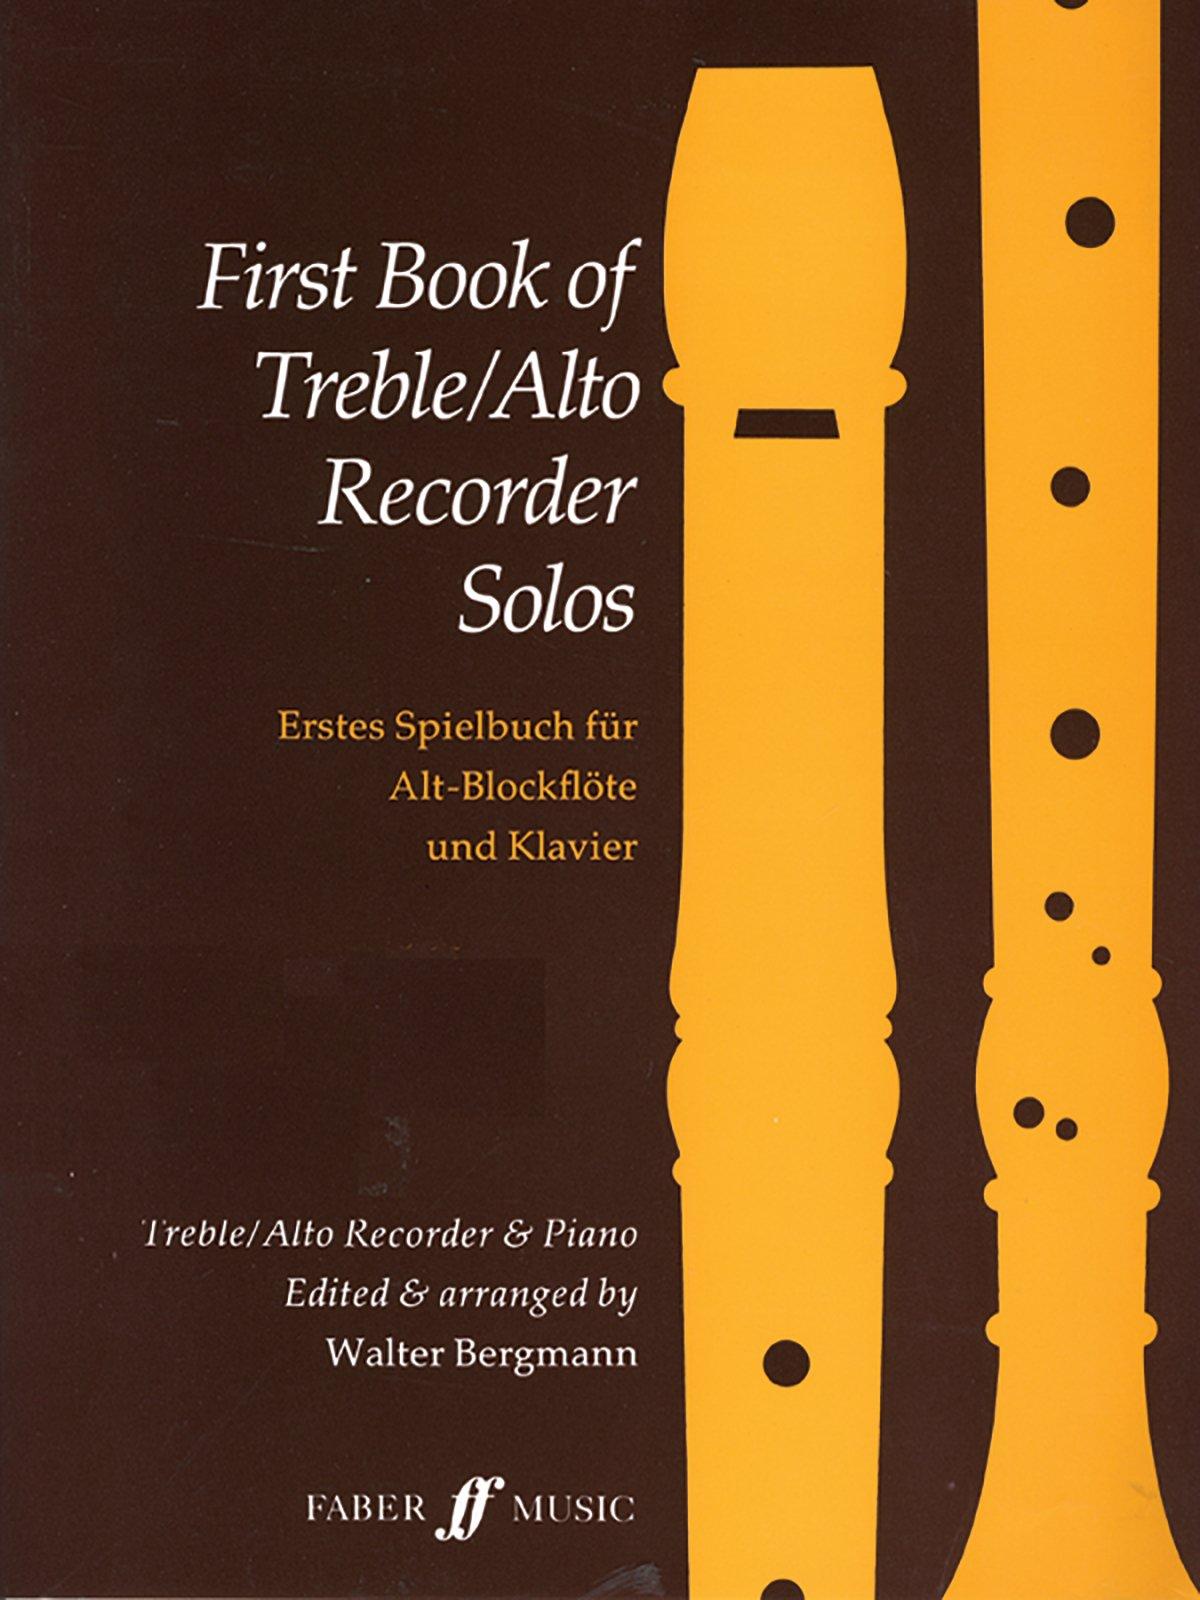 First Book of Treble / Alto Recorder Solos (Faber Edition)